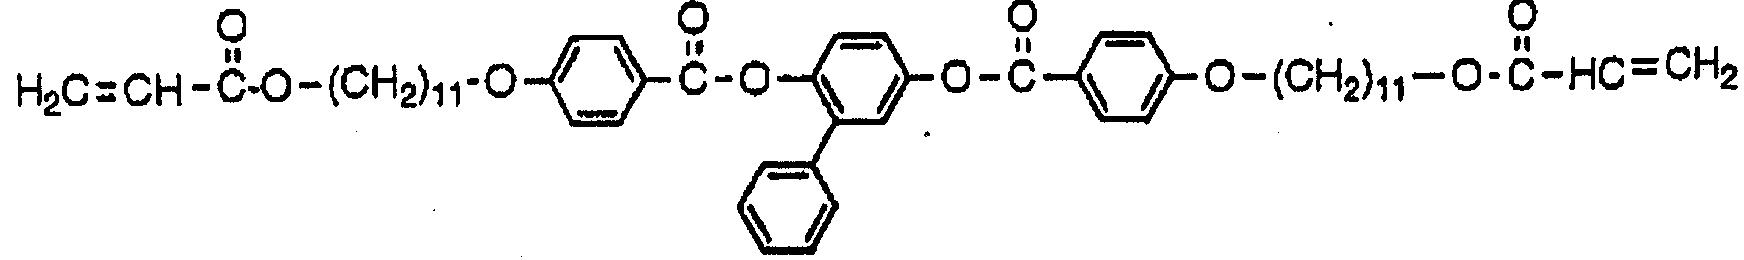 Figure 112003021761633-pct00001